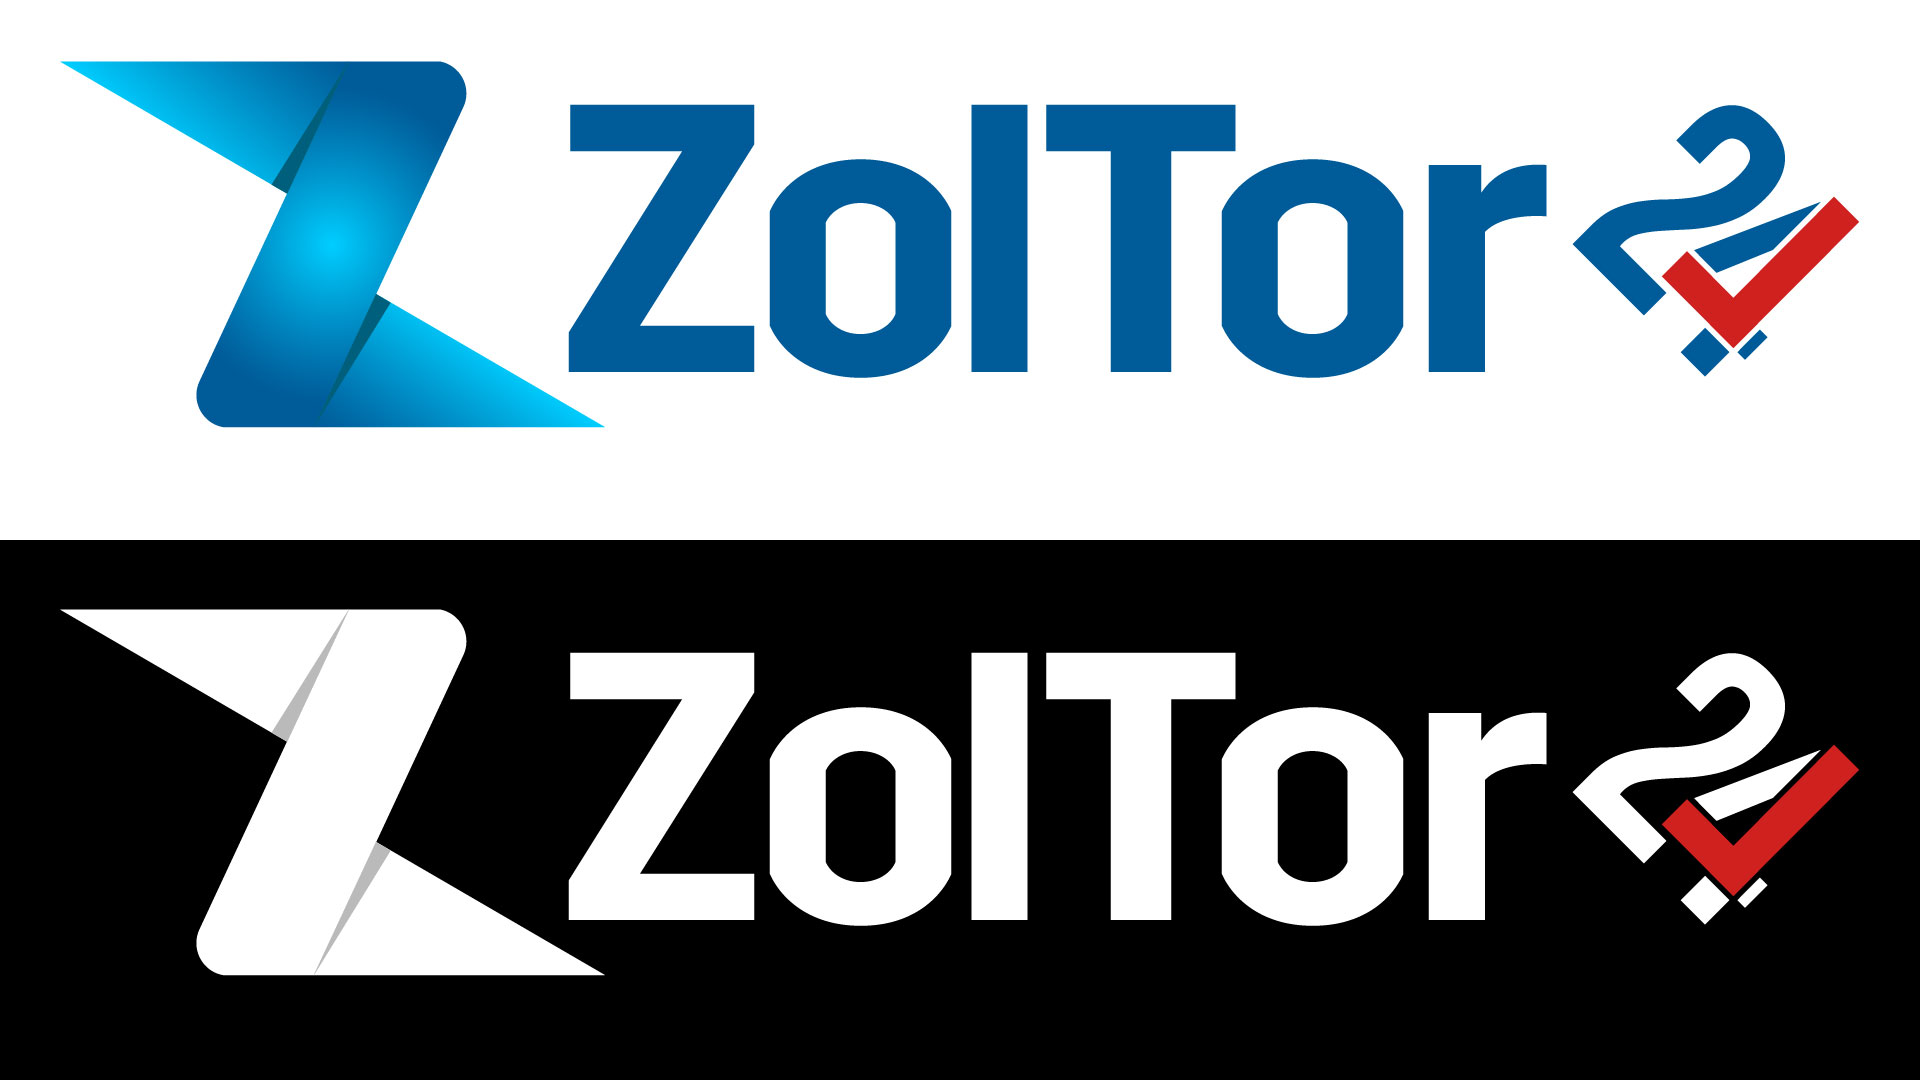 Логотип и фирменный стиль ZolTor24 фото f_5545c90ae4fe0c0d.jpg